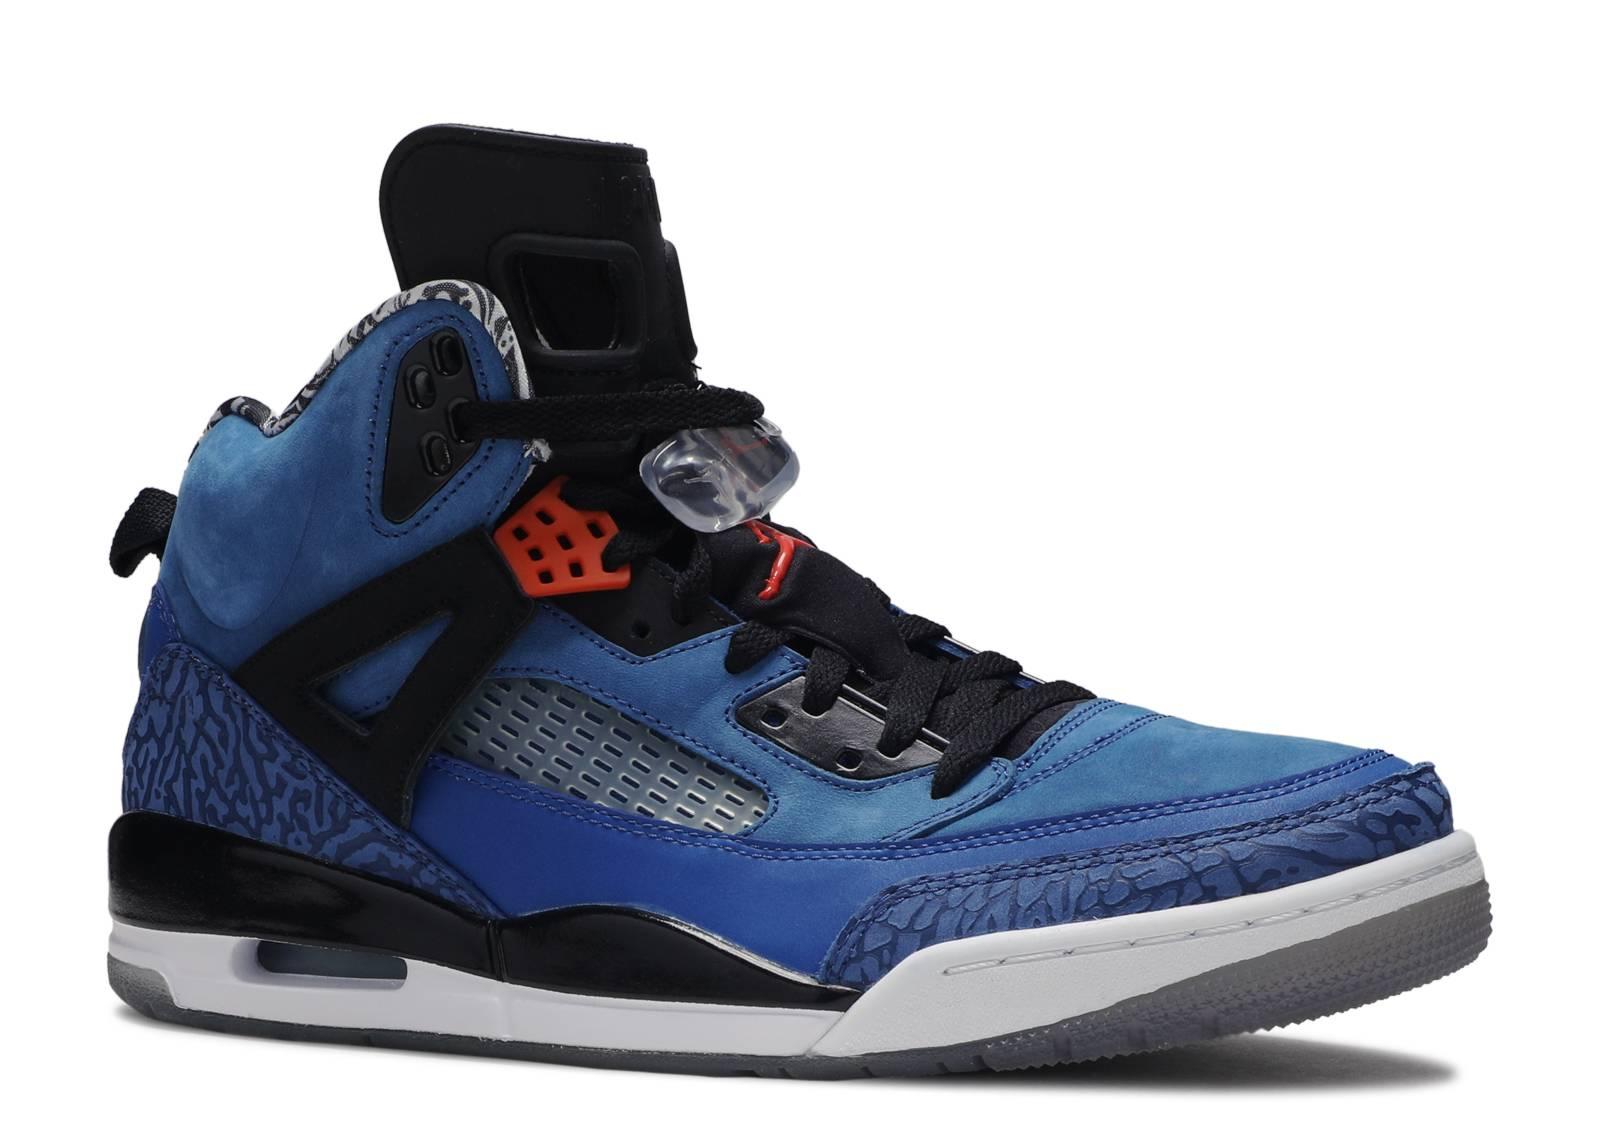 buy popular 6eaac b1ffd Jordan Spiz ike